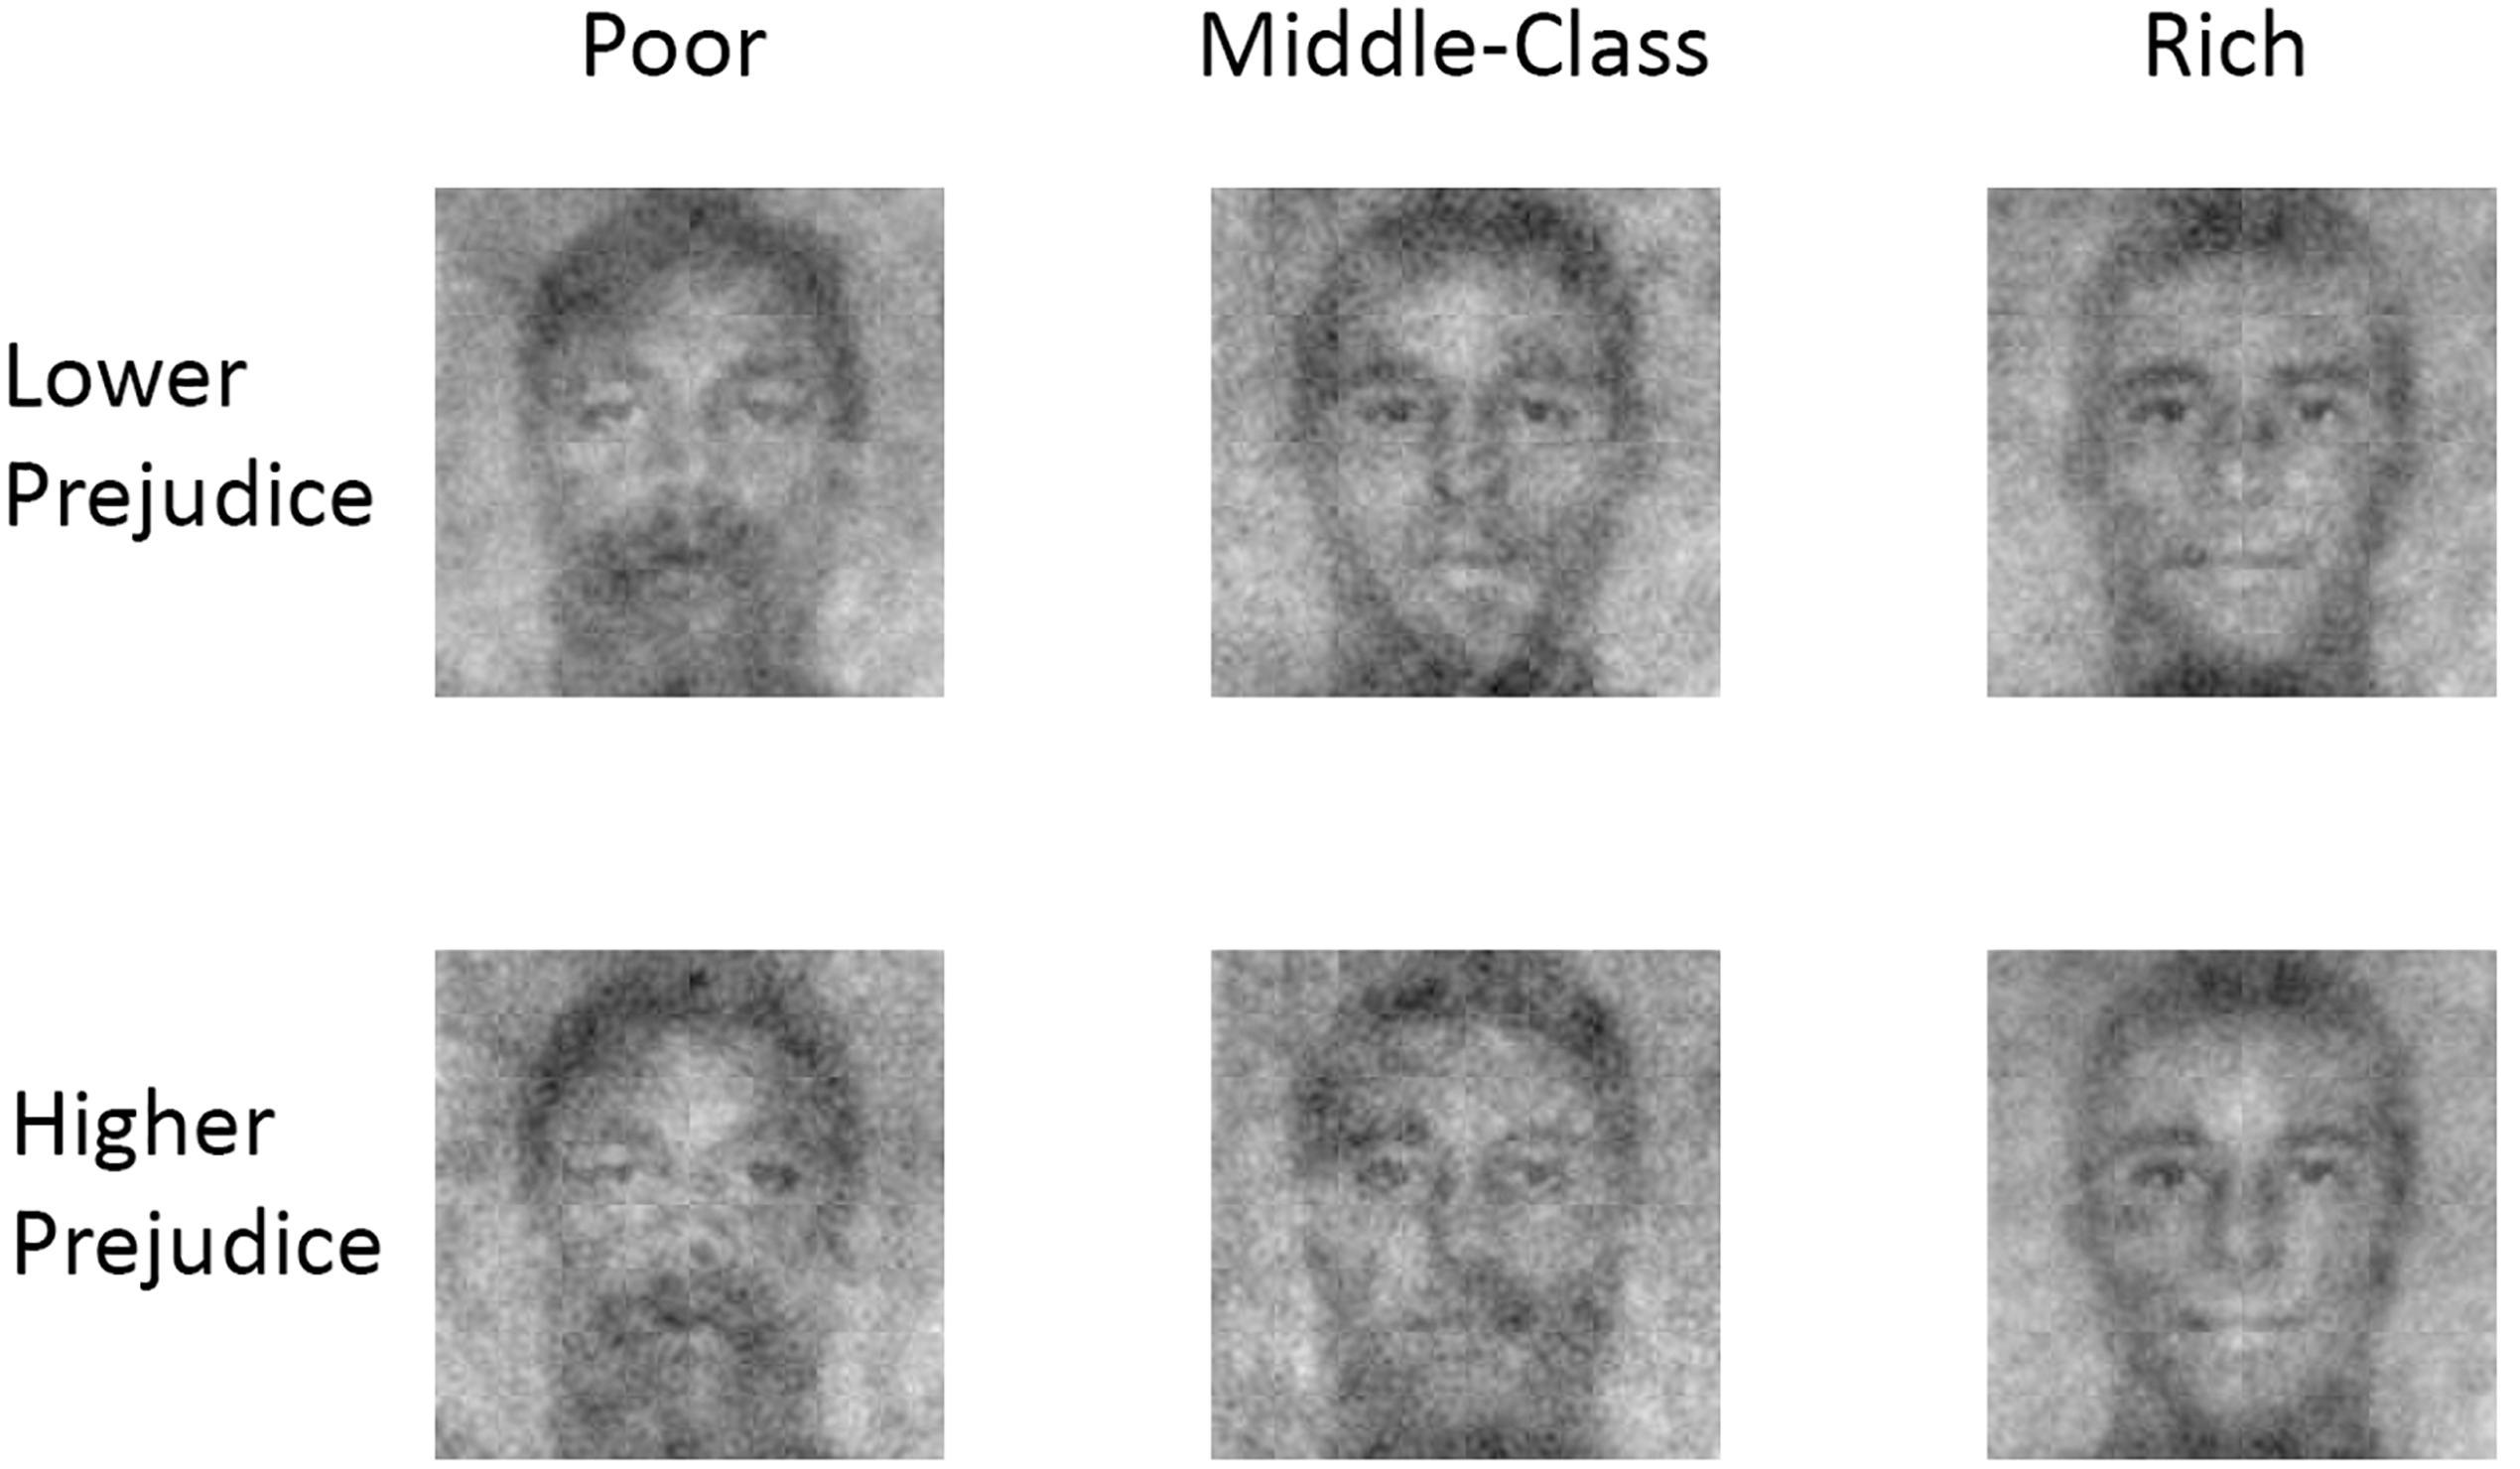 Studies Confirm Dehumanization Of Black >> Frontiers Racial Assumptions Color The Mental Representation Of